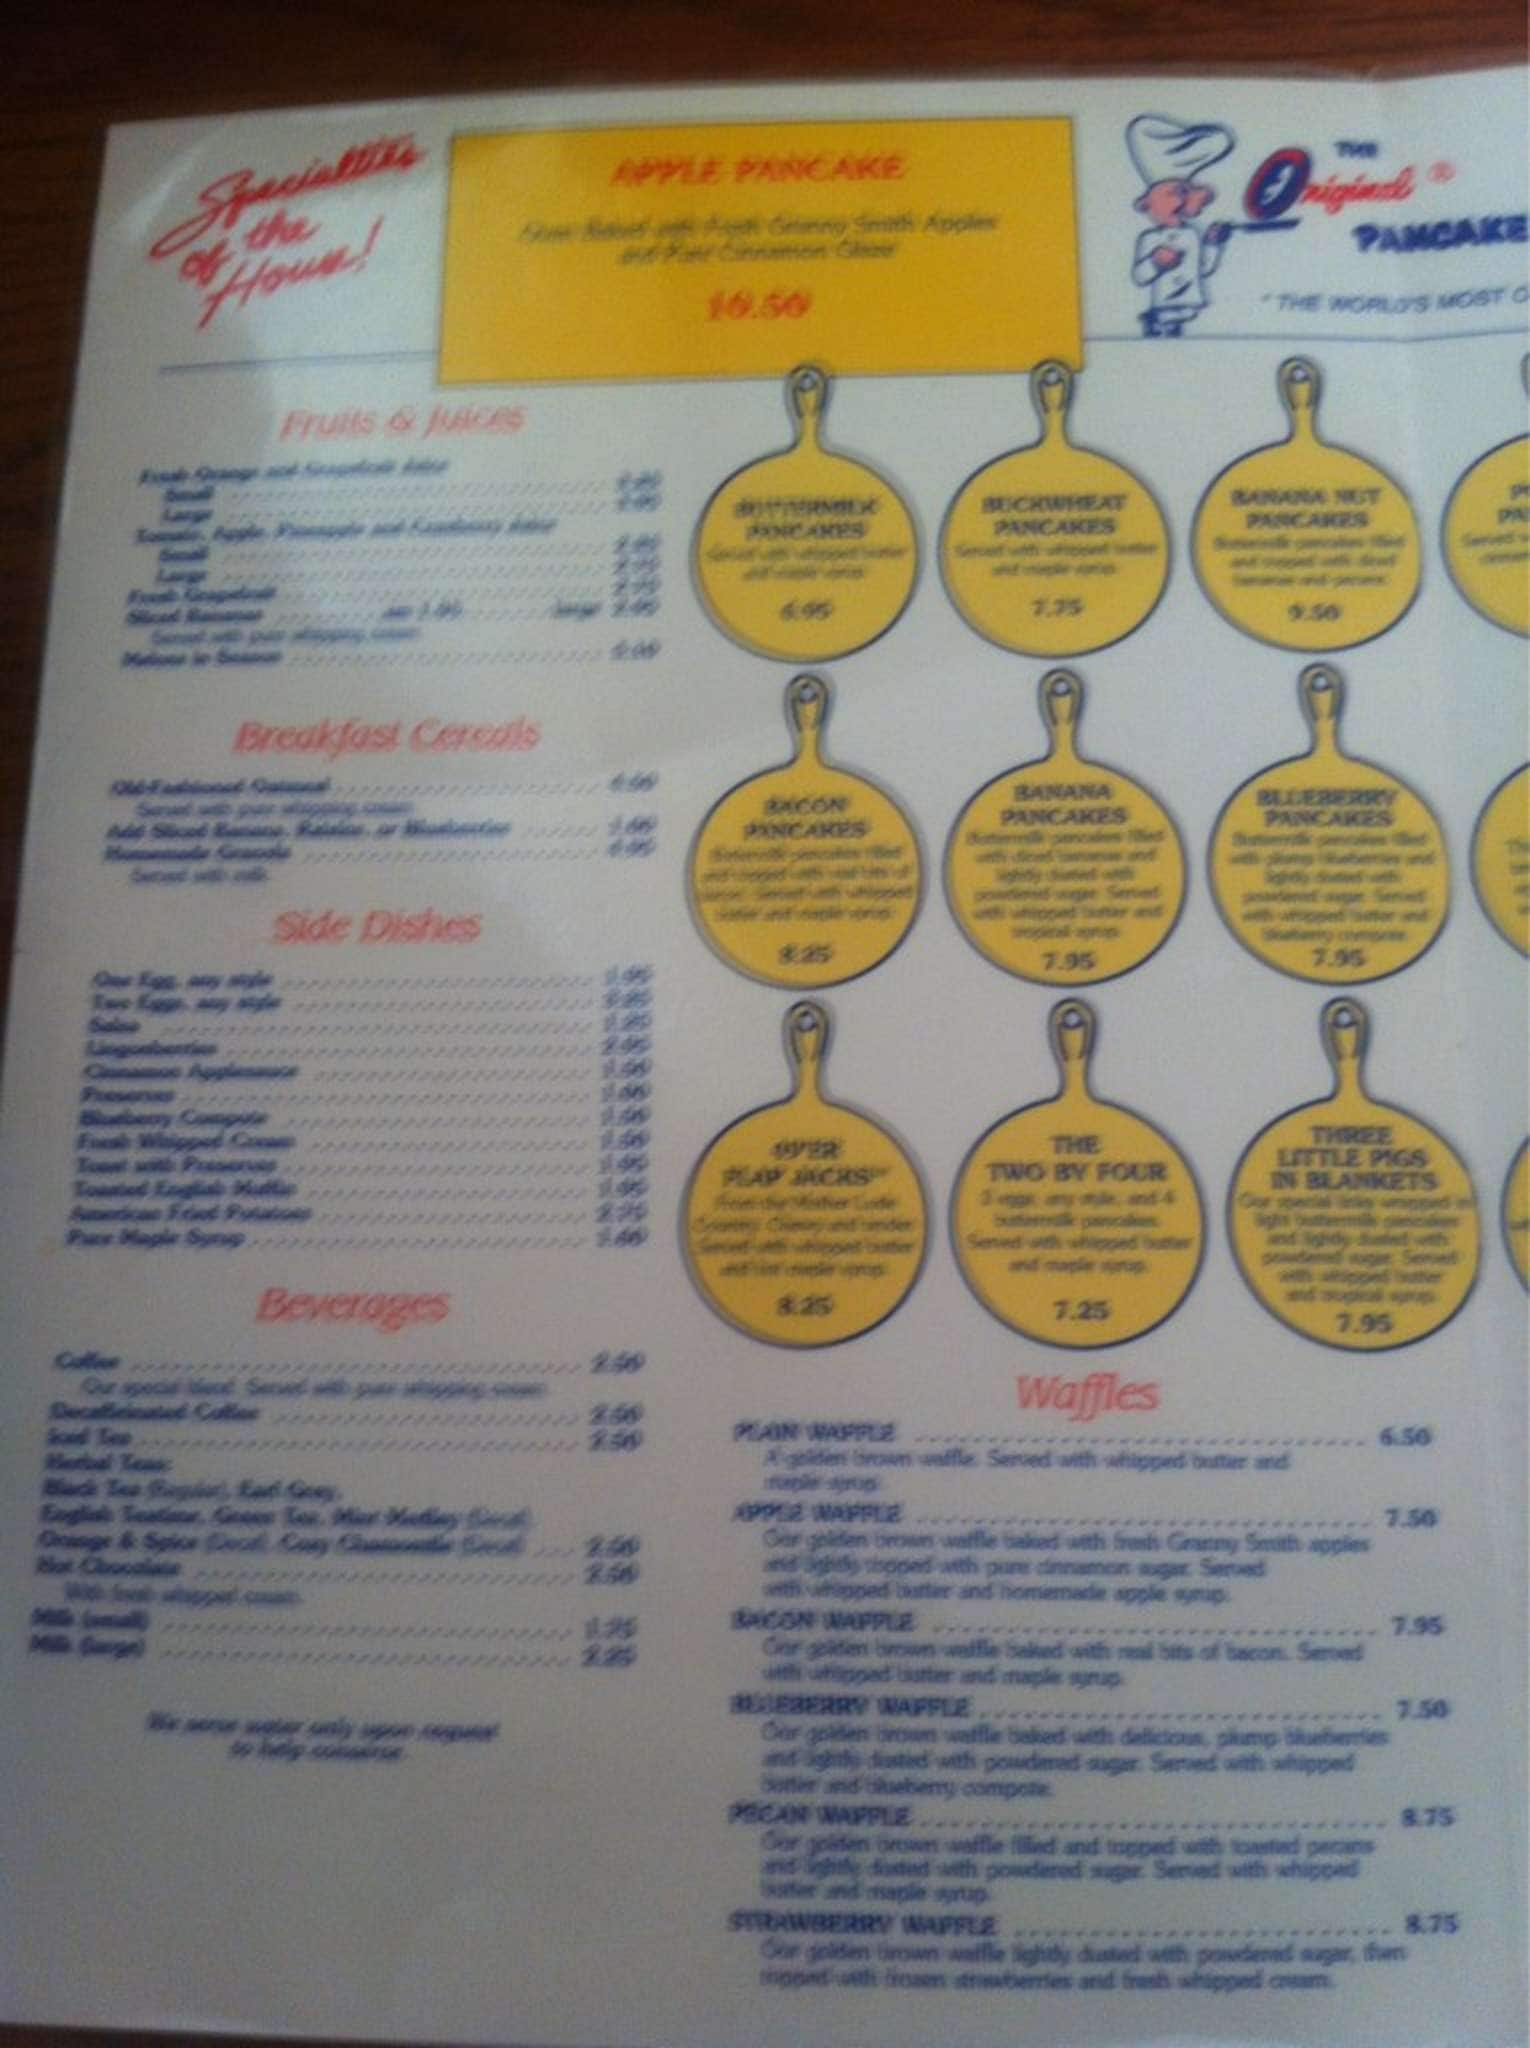 Menu at Original Pancake House restaurant San Diego Convoy St